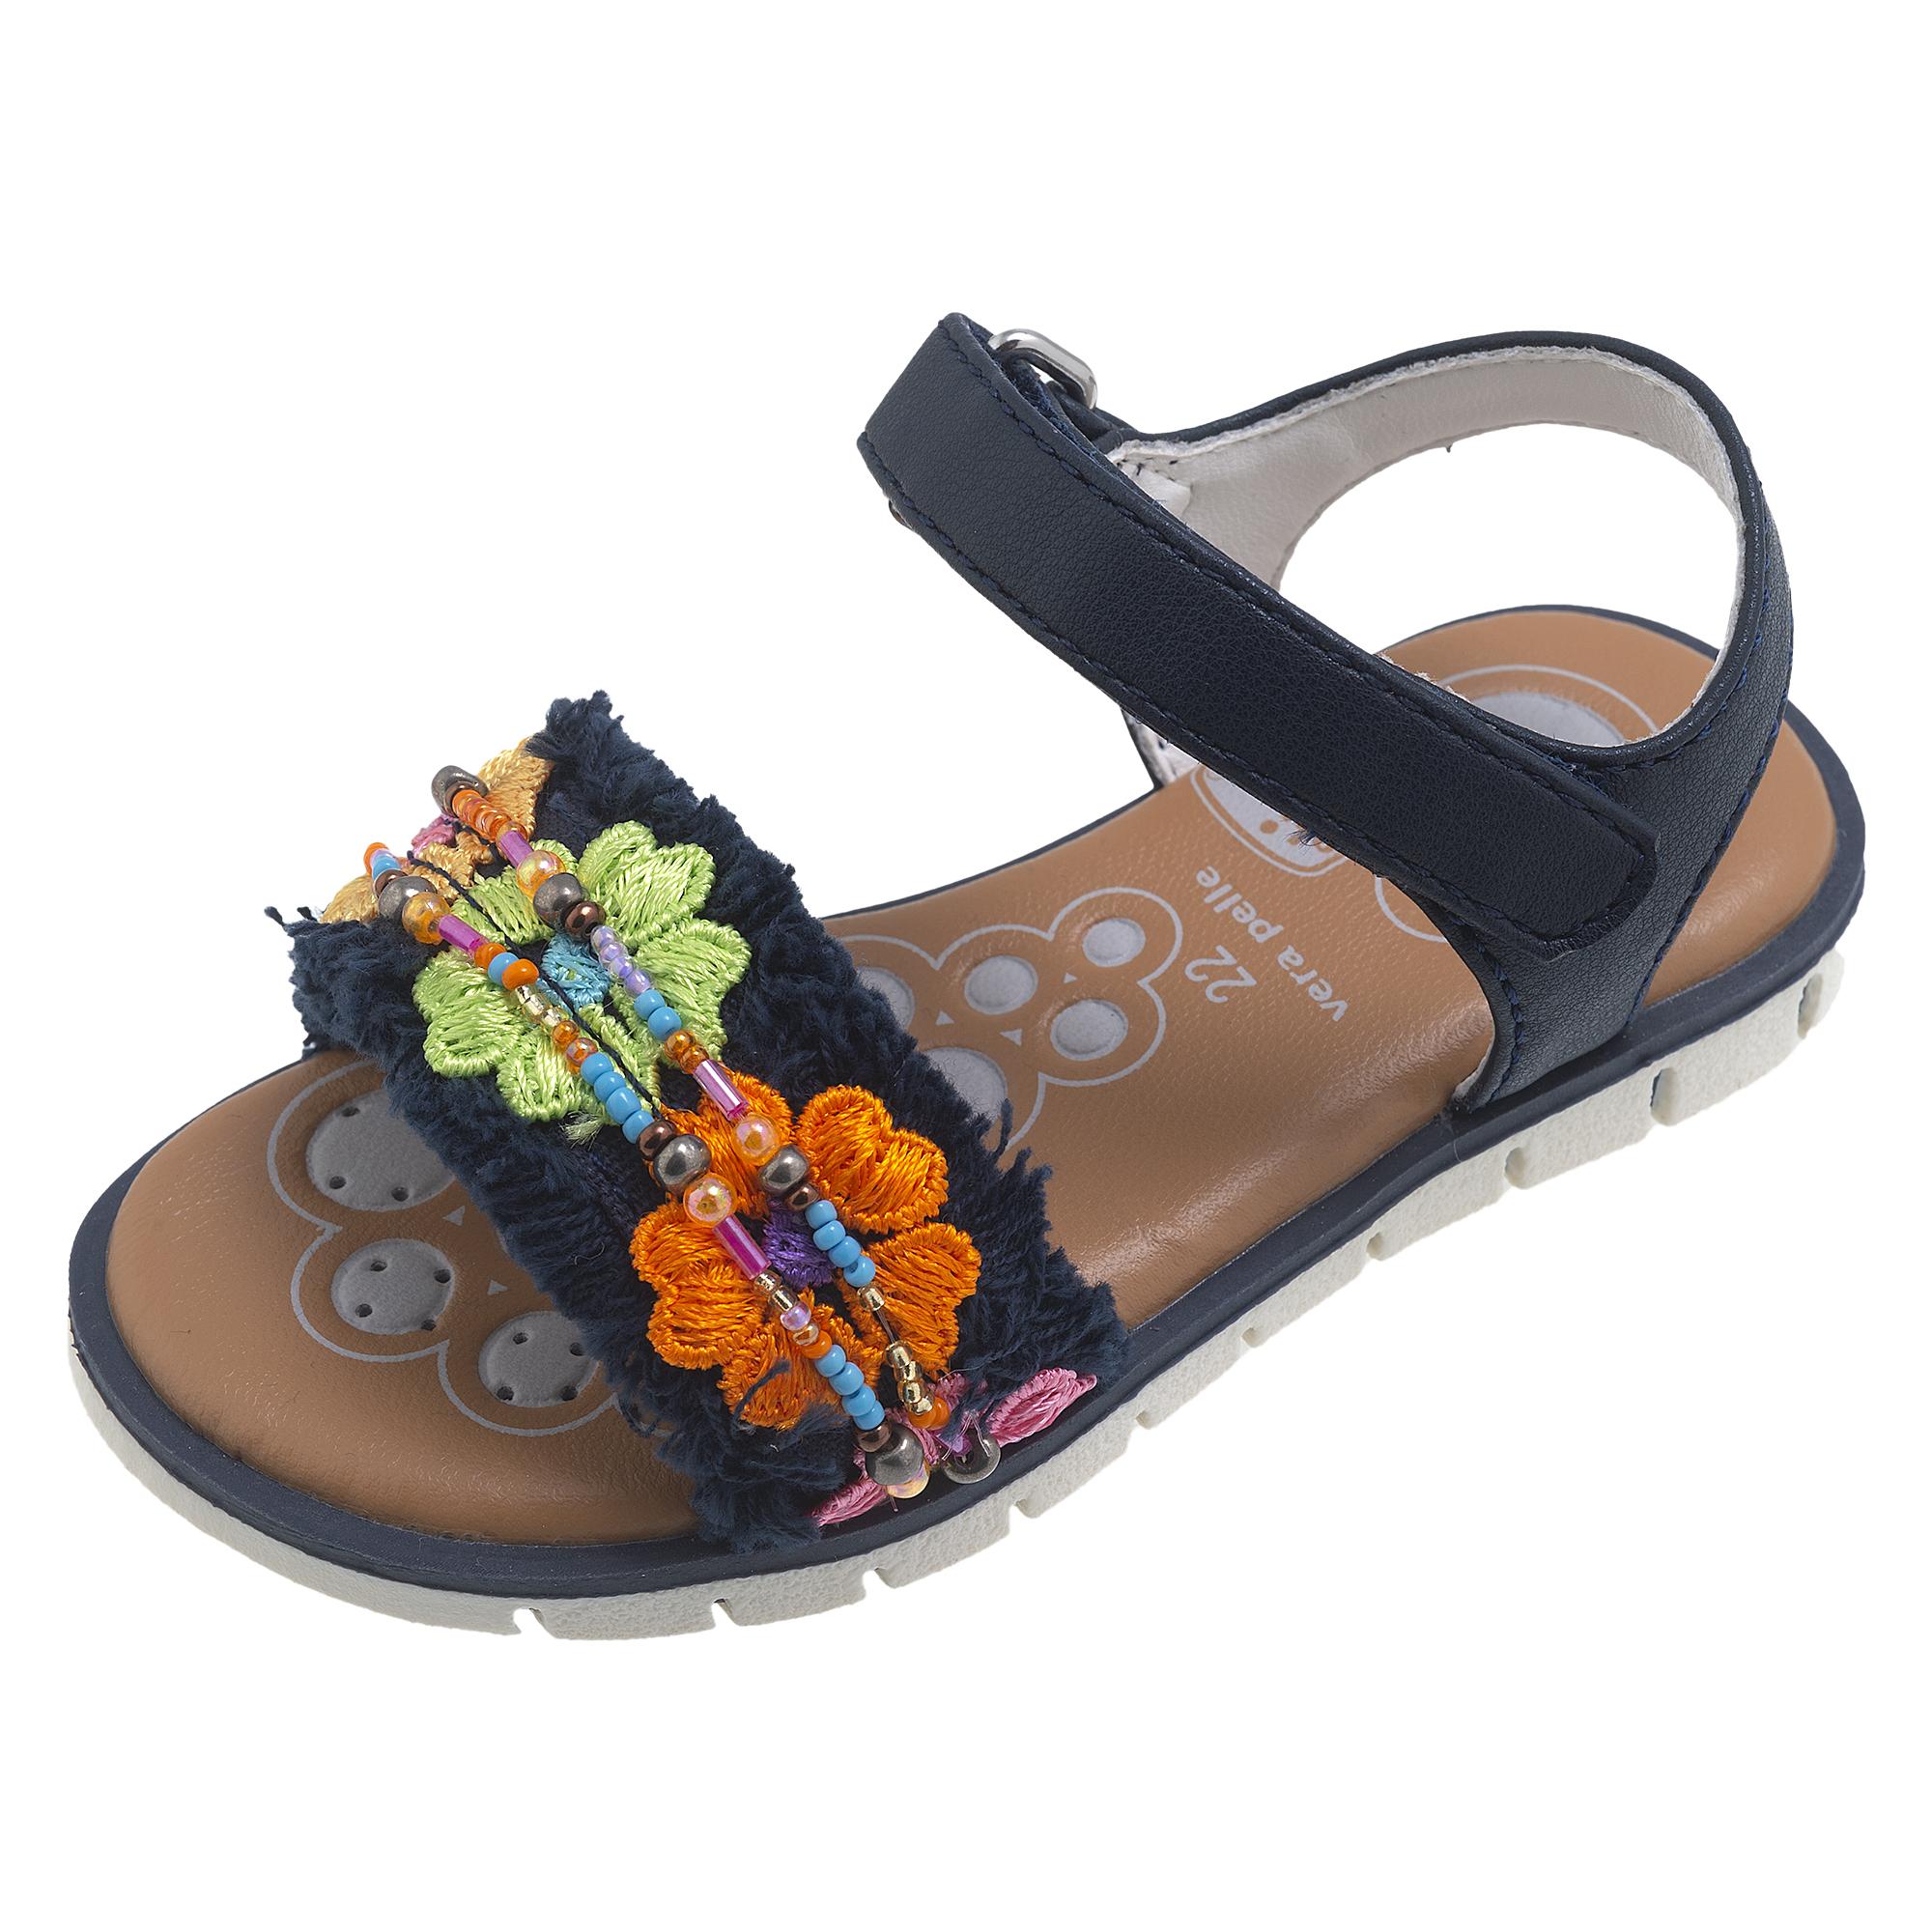 Sandale copii Chicco Cayla, albastru cu model, 65505